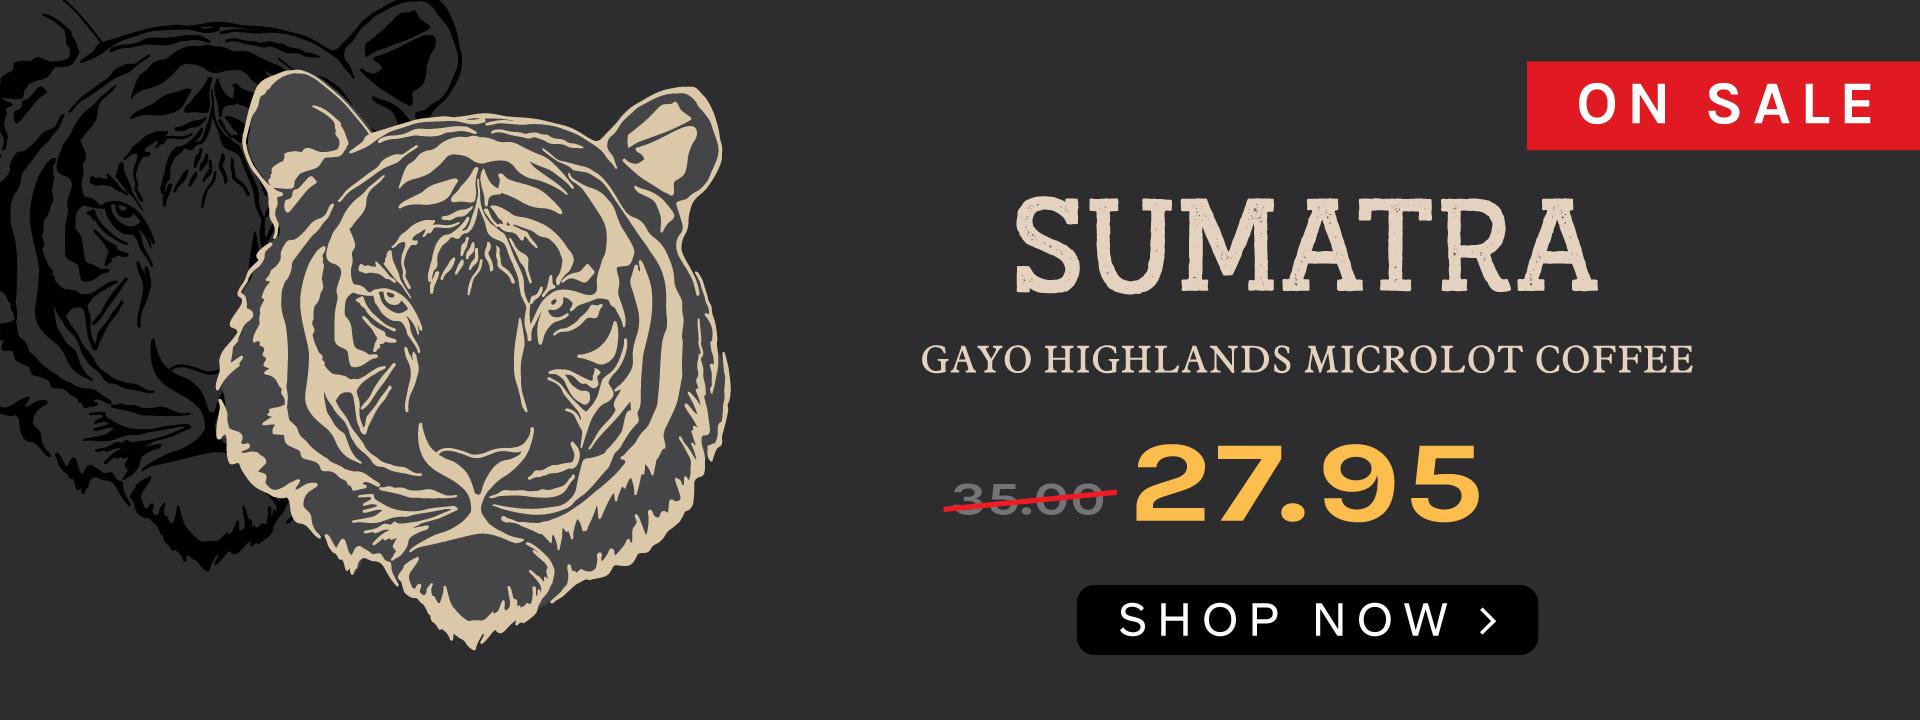 sumatra